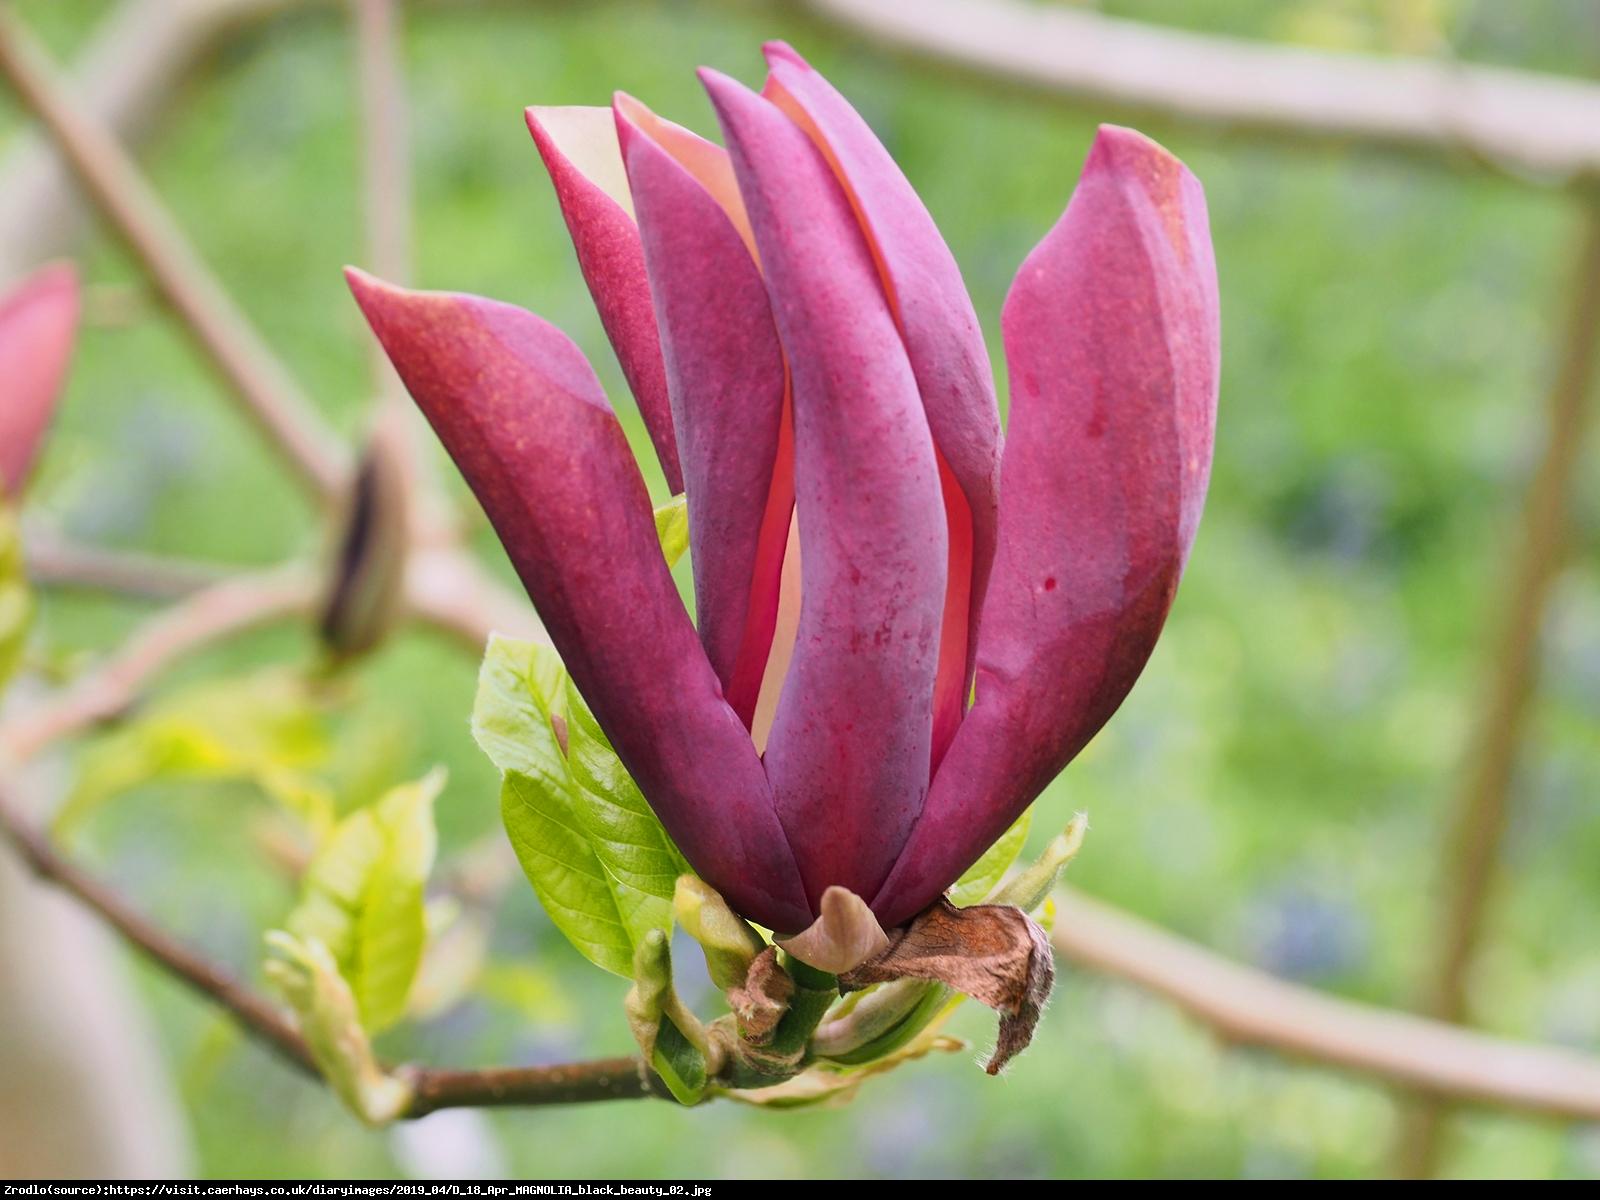 Magnolia Black Beauty - Magnolia Black Beauty